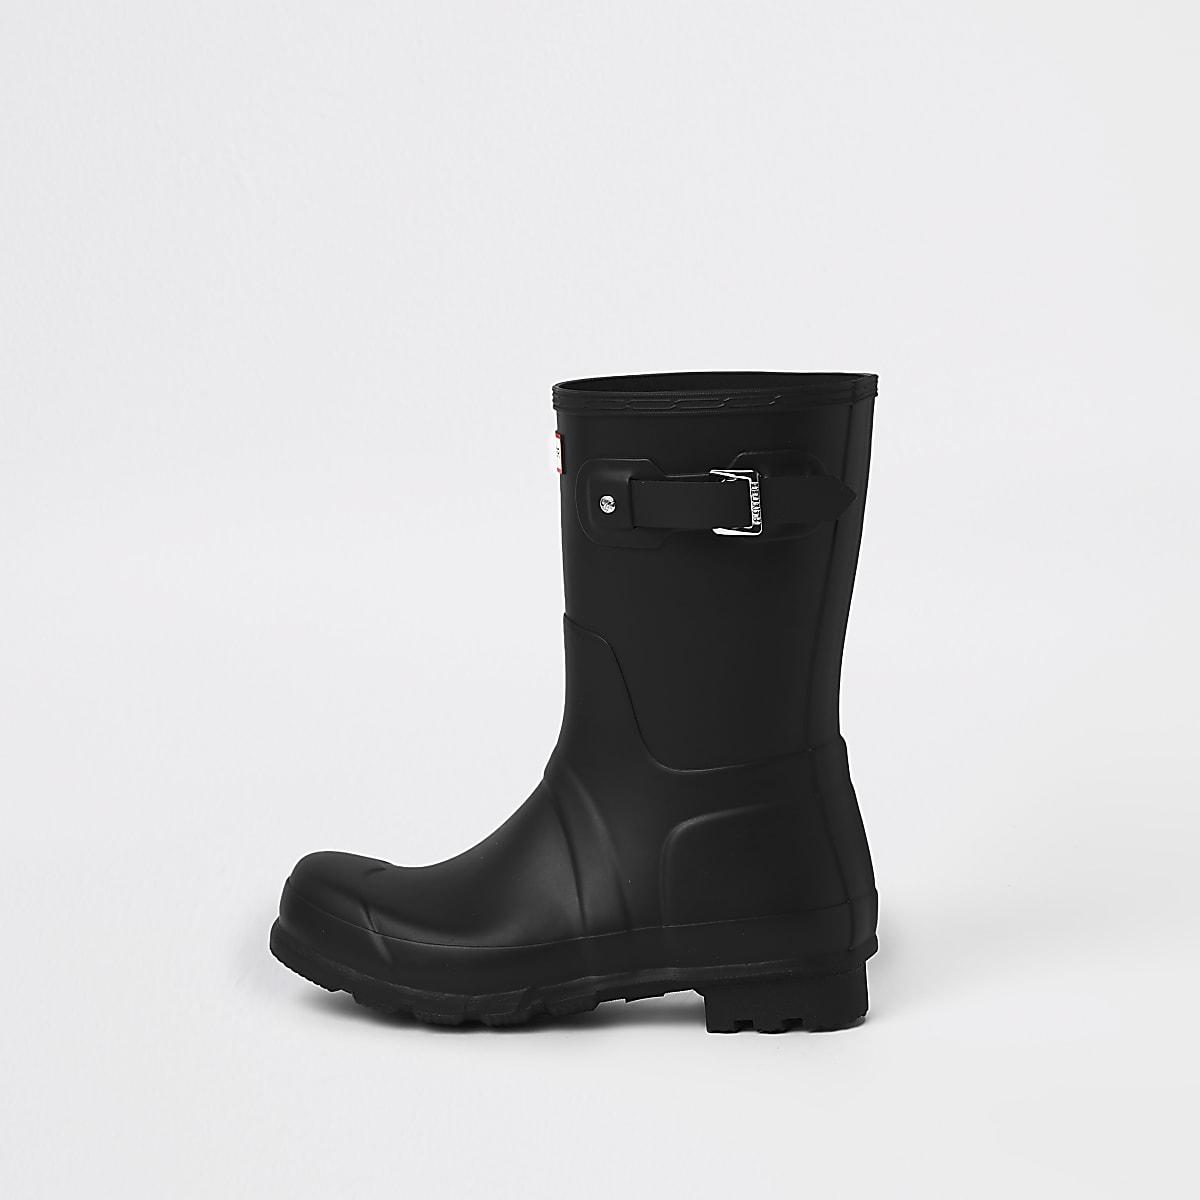 Hunter Original black short rubber boots